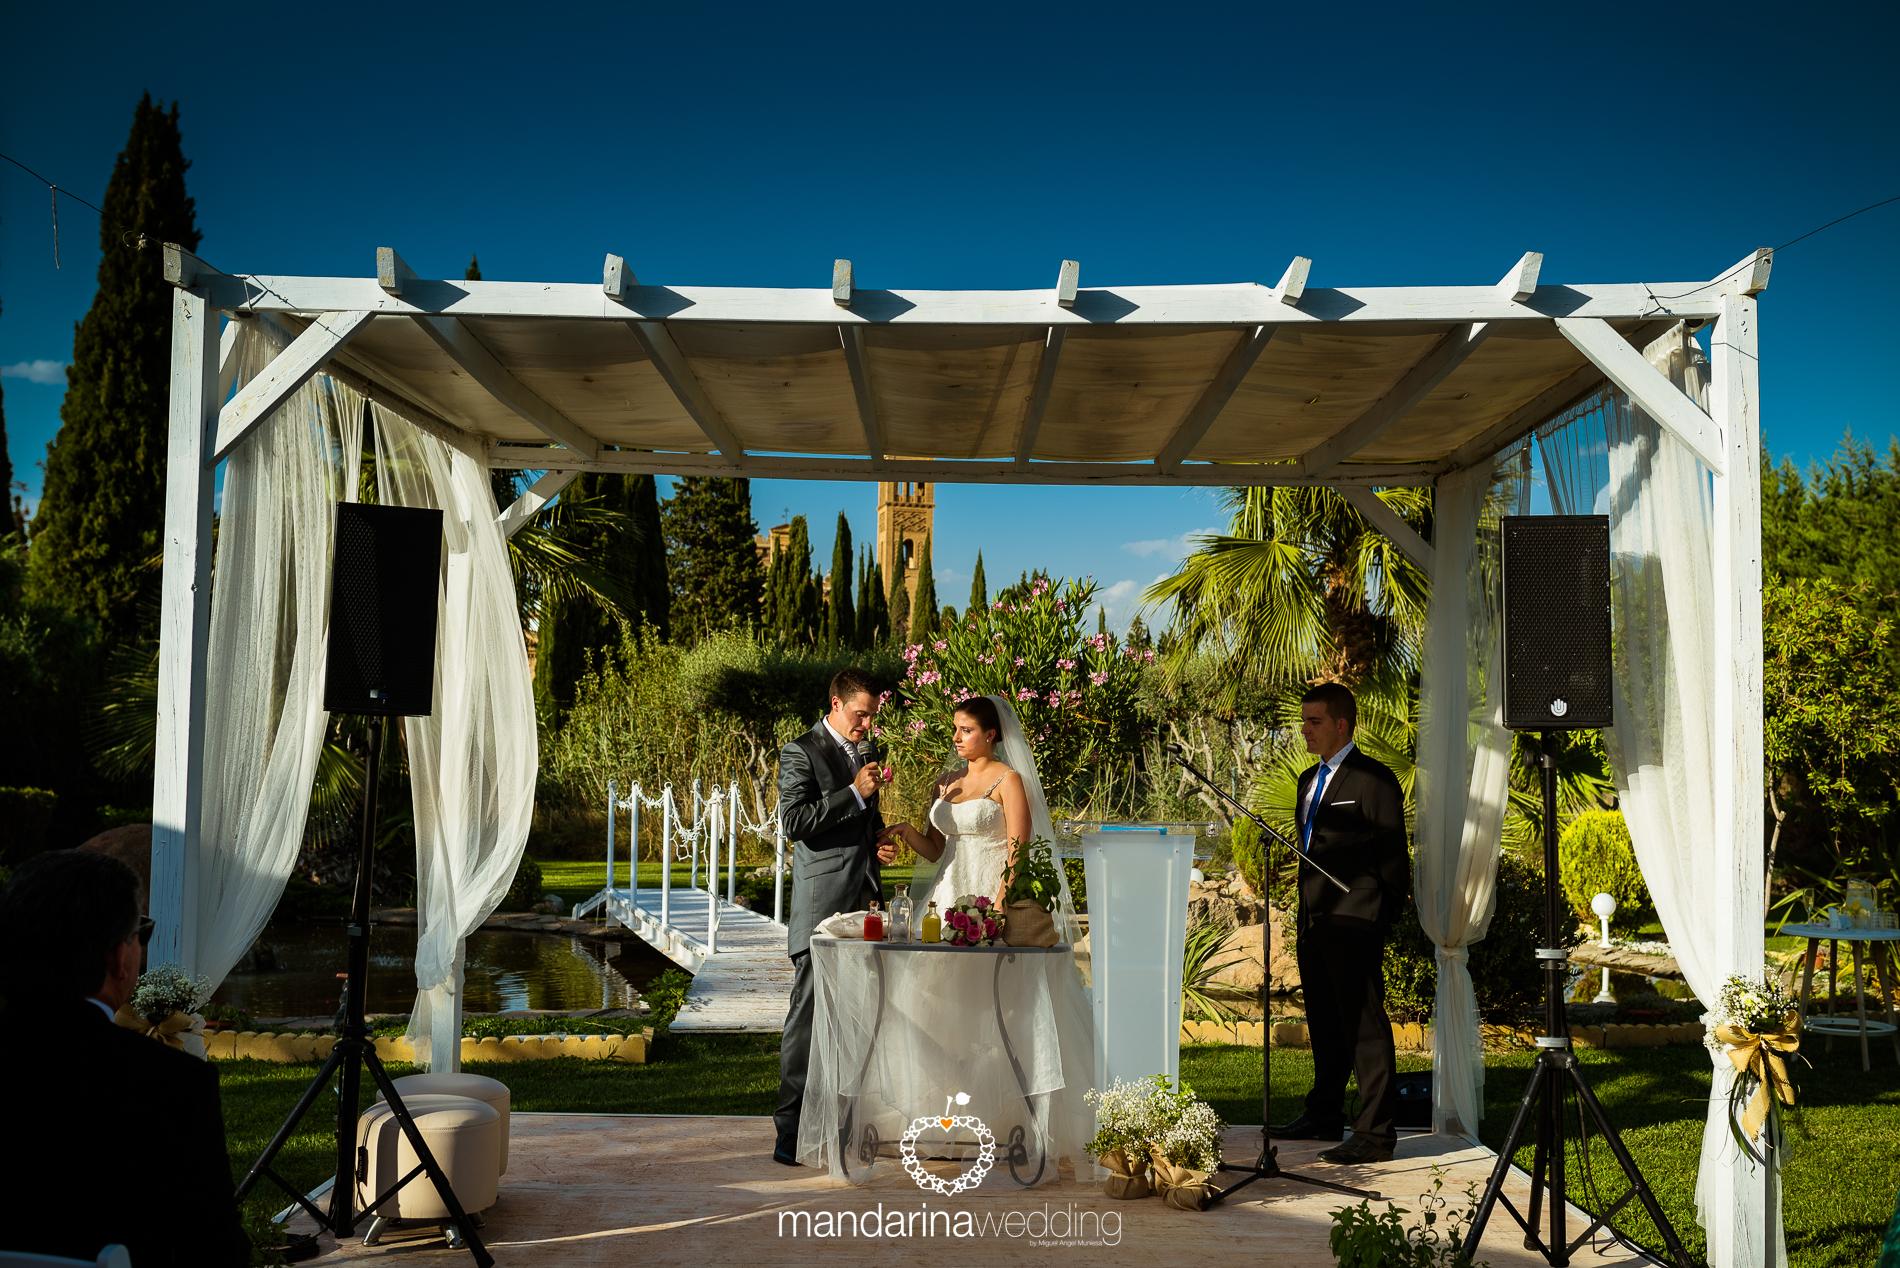 mandarina wedding, mejores fotografos boda, fotografo zaragoza, fotografo huesca, fotografo soria, fotografo lerida_48